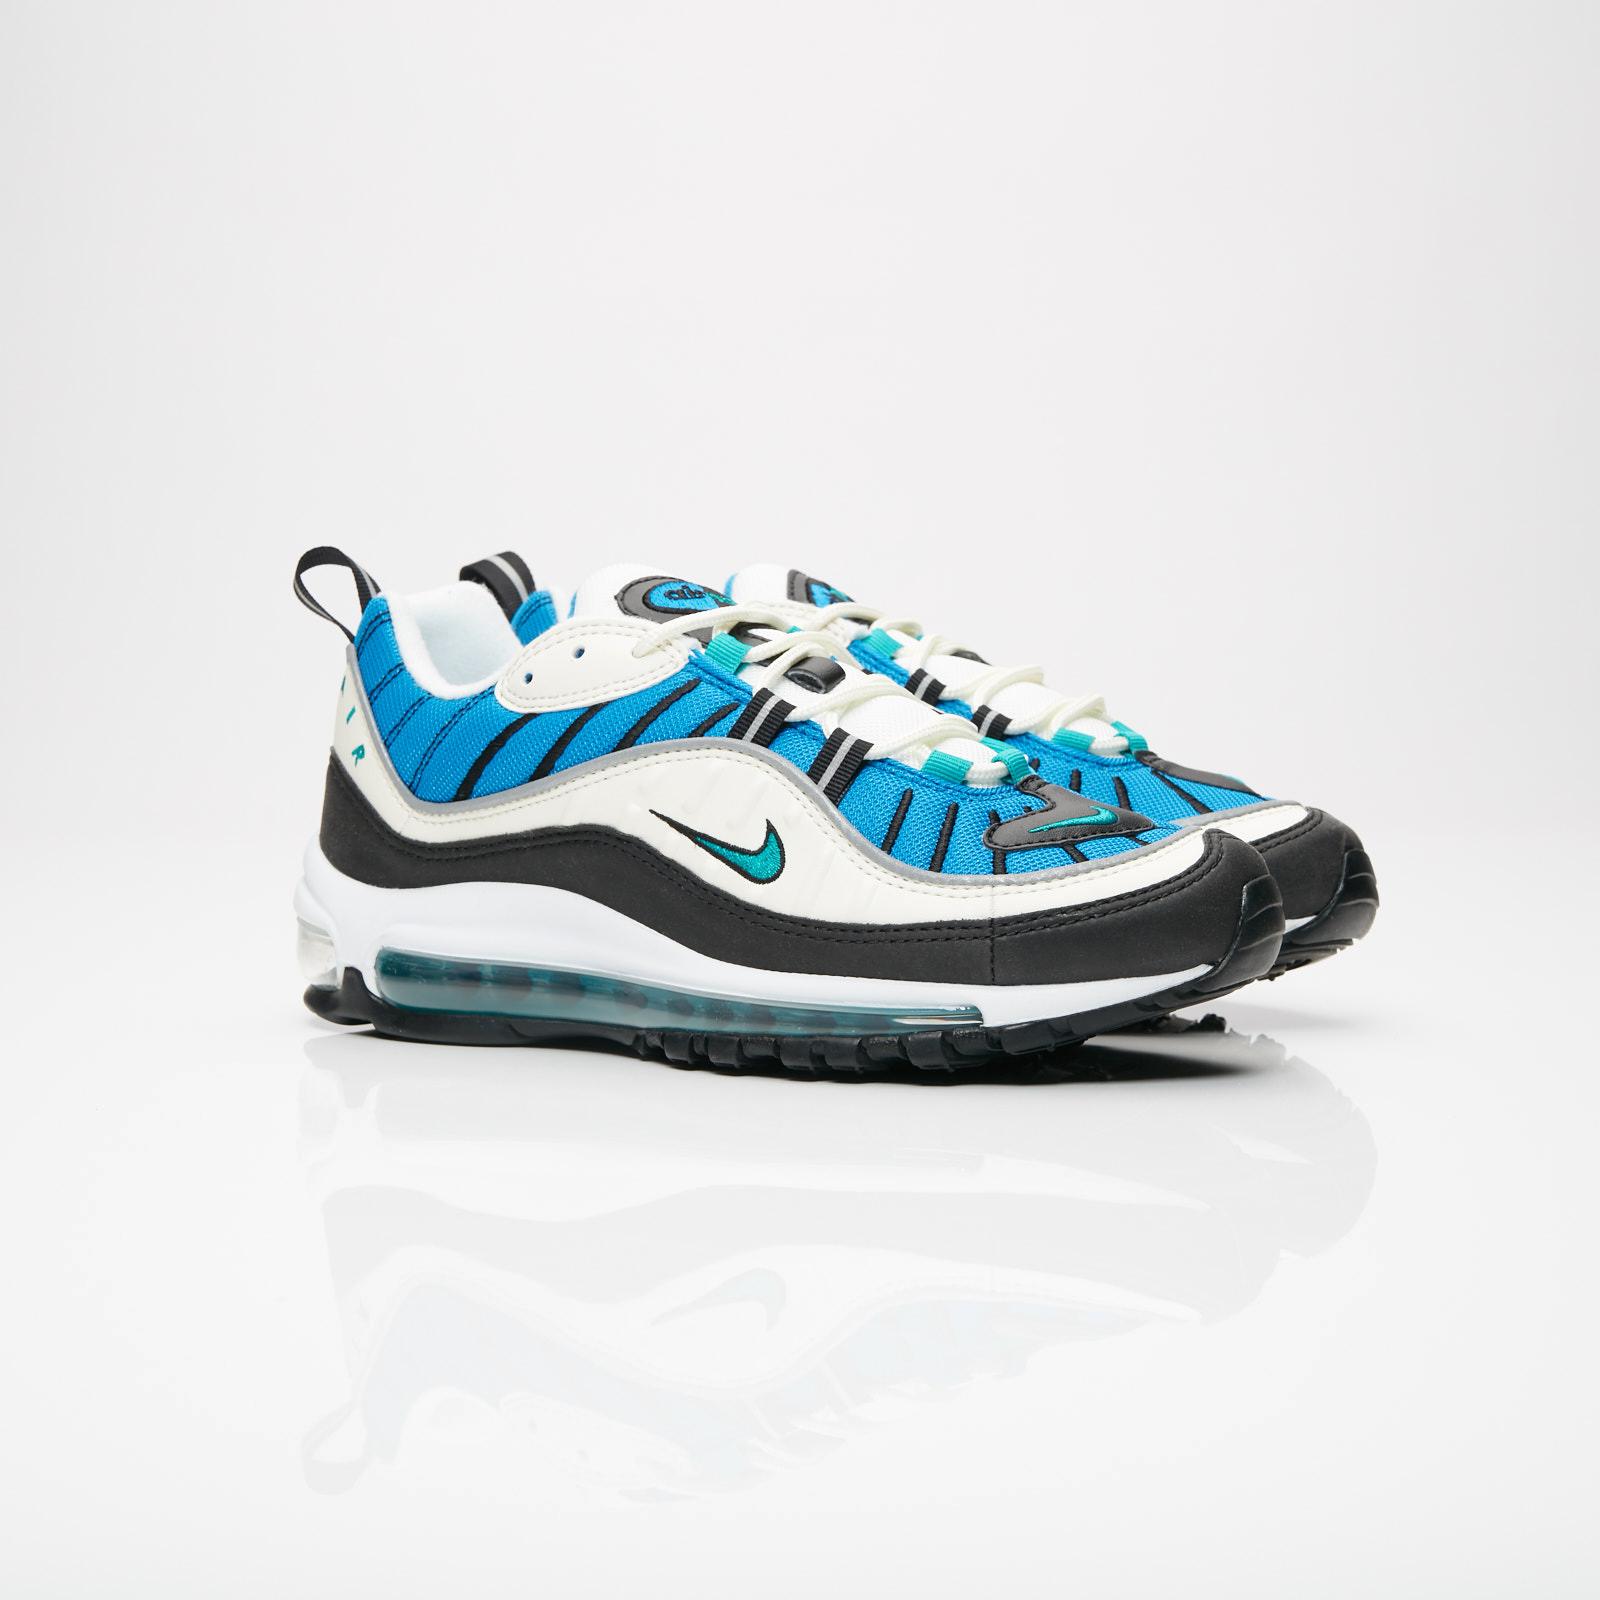 b65f2e6304 Nike Wmns Air Max 98 - Ah6799-106 - Sneakersnstuff | sneakers ...